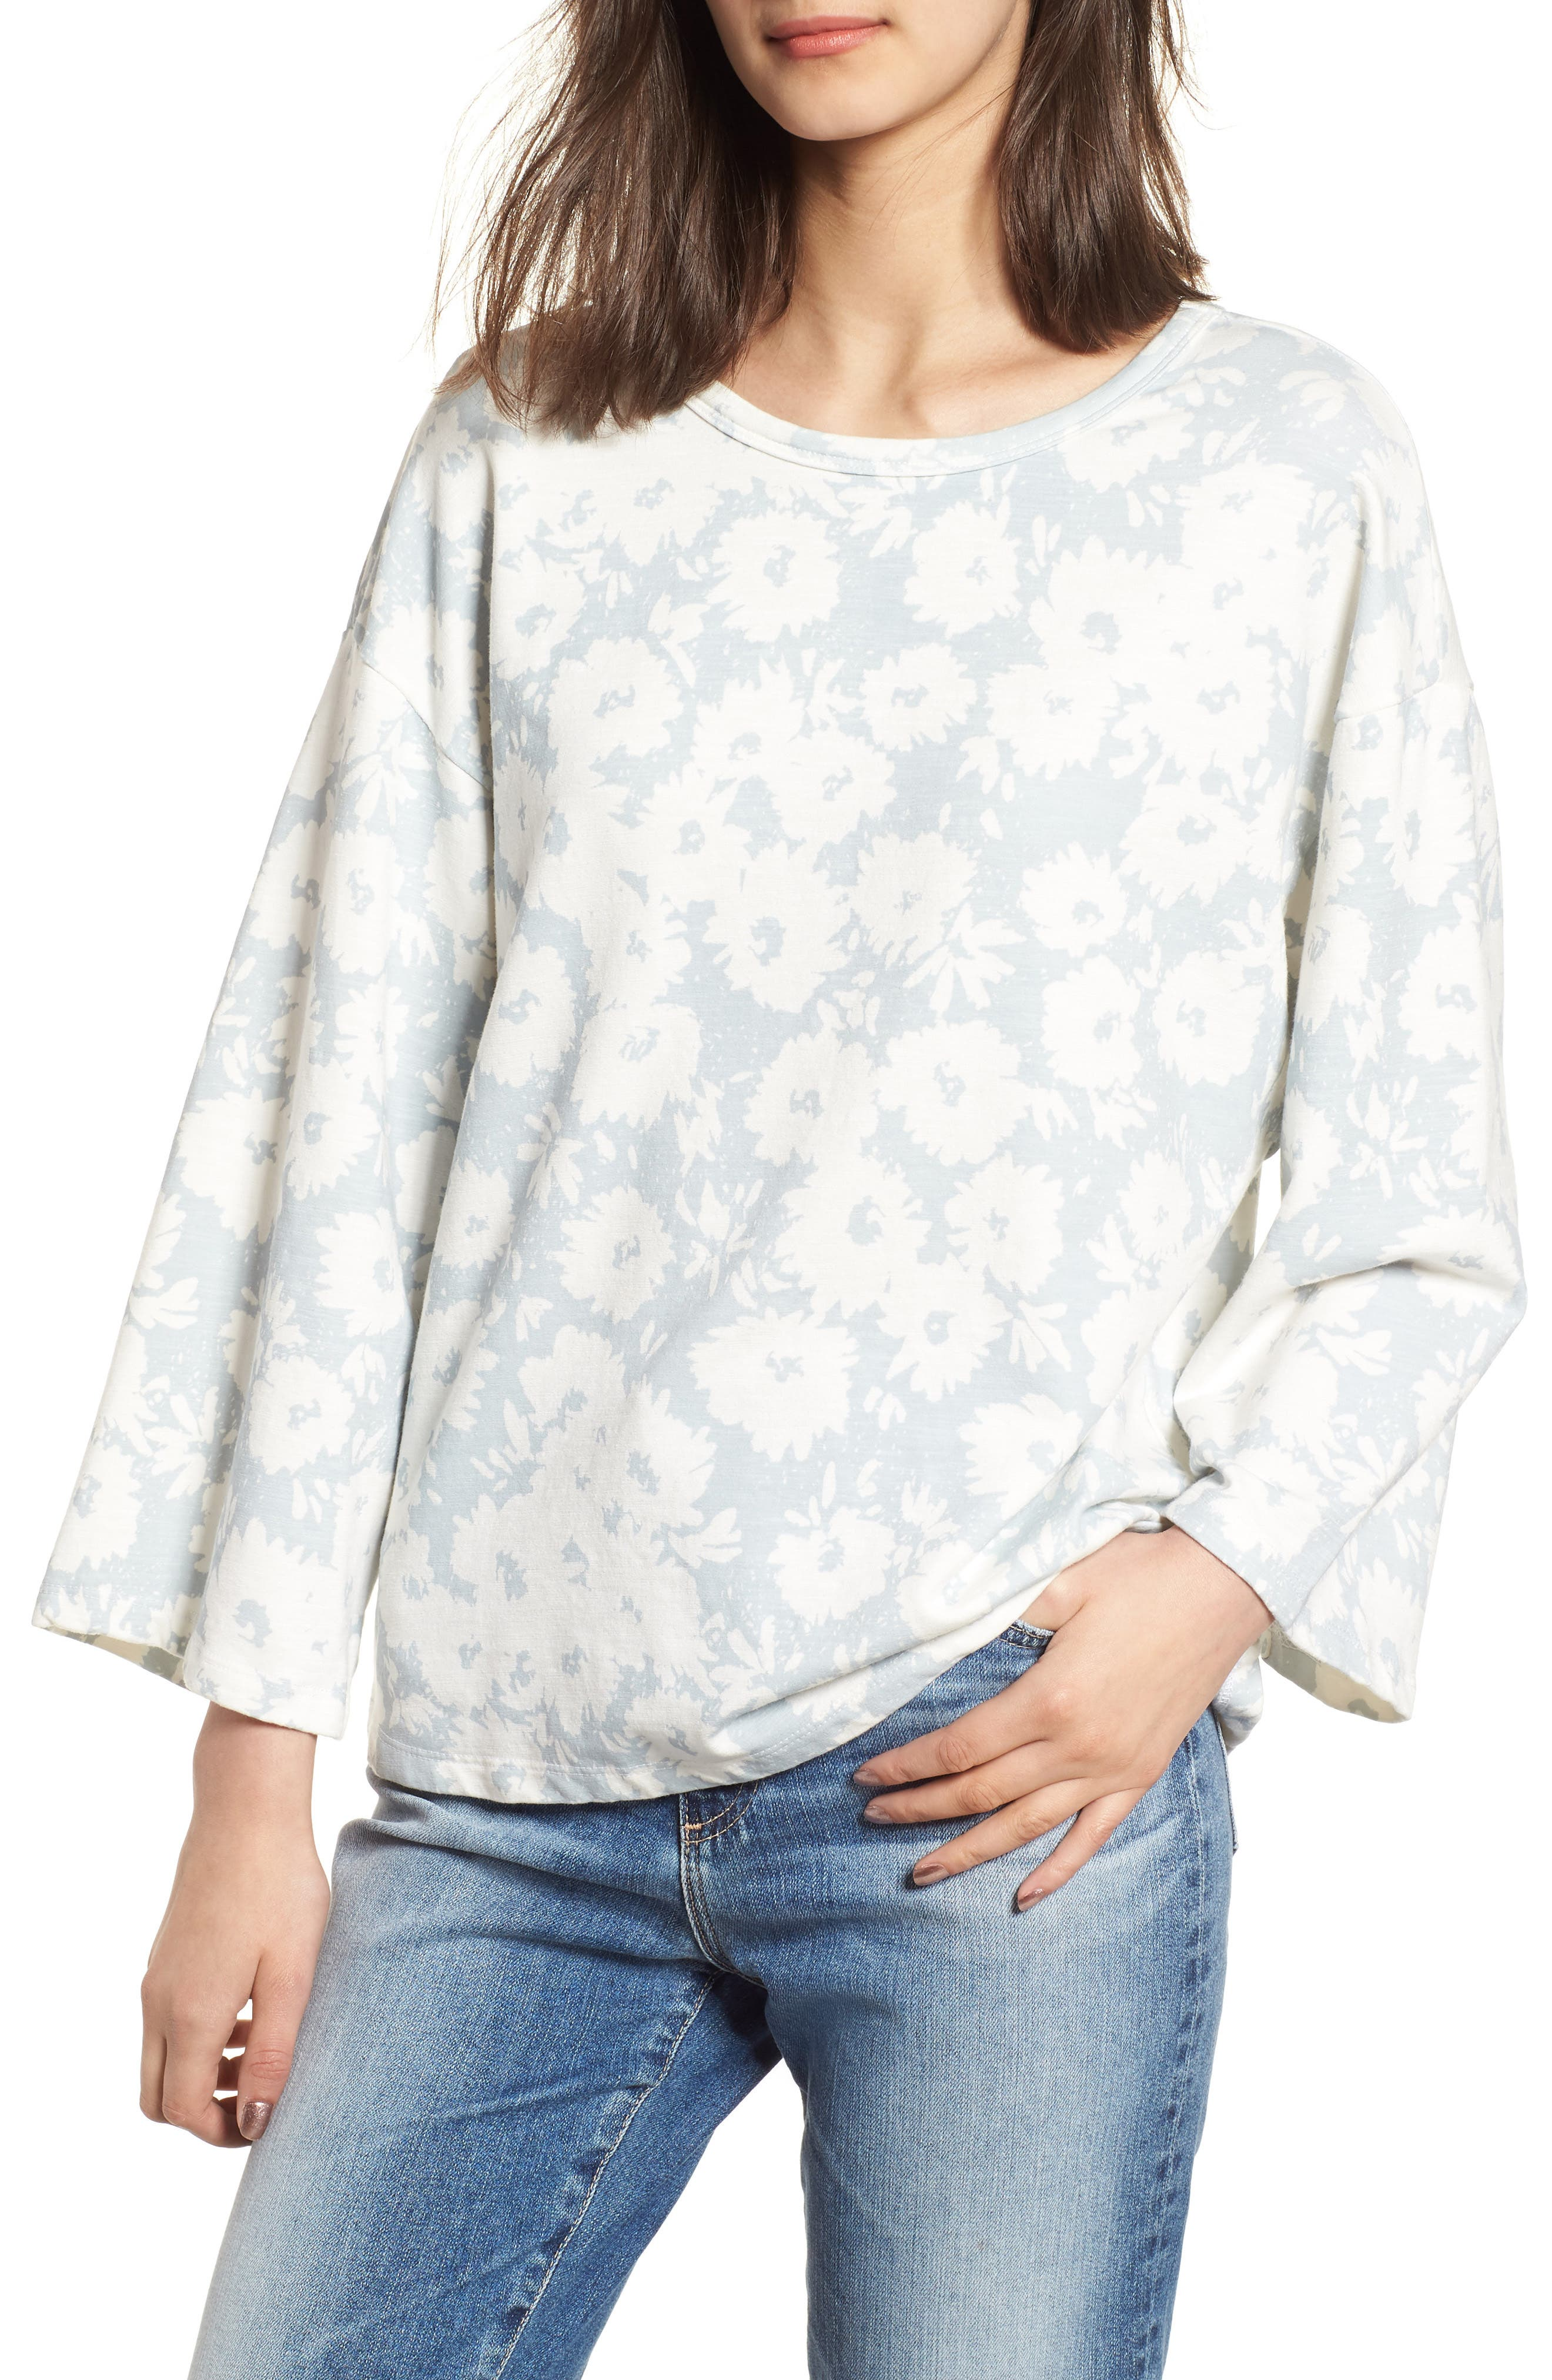 Sundry Kimono Sweatshirt